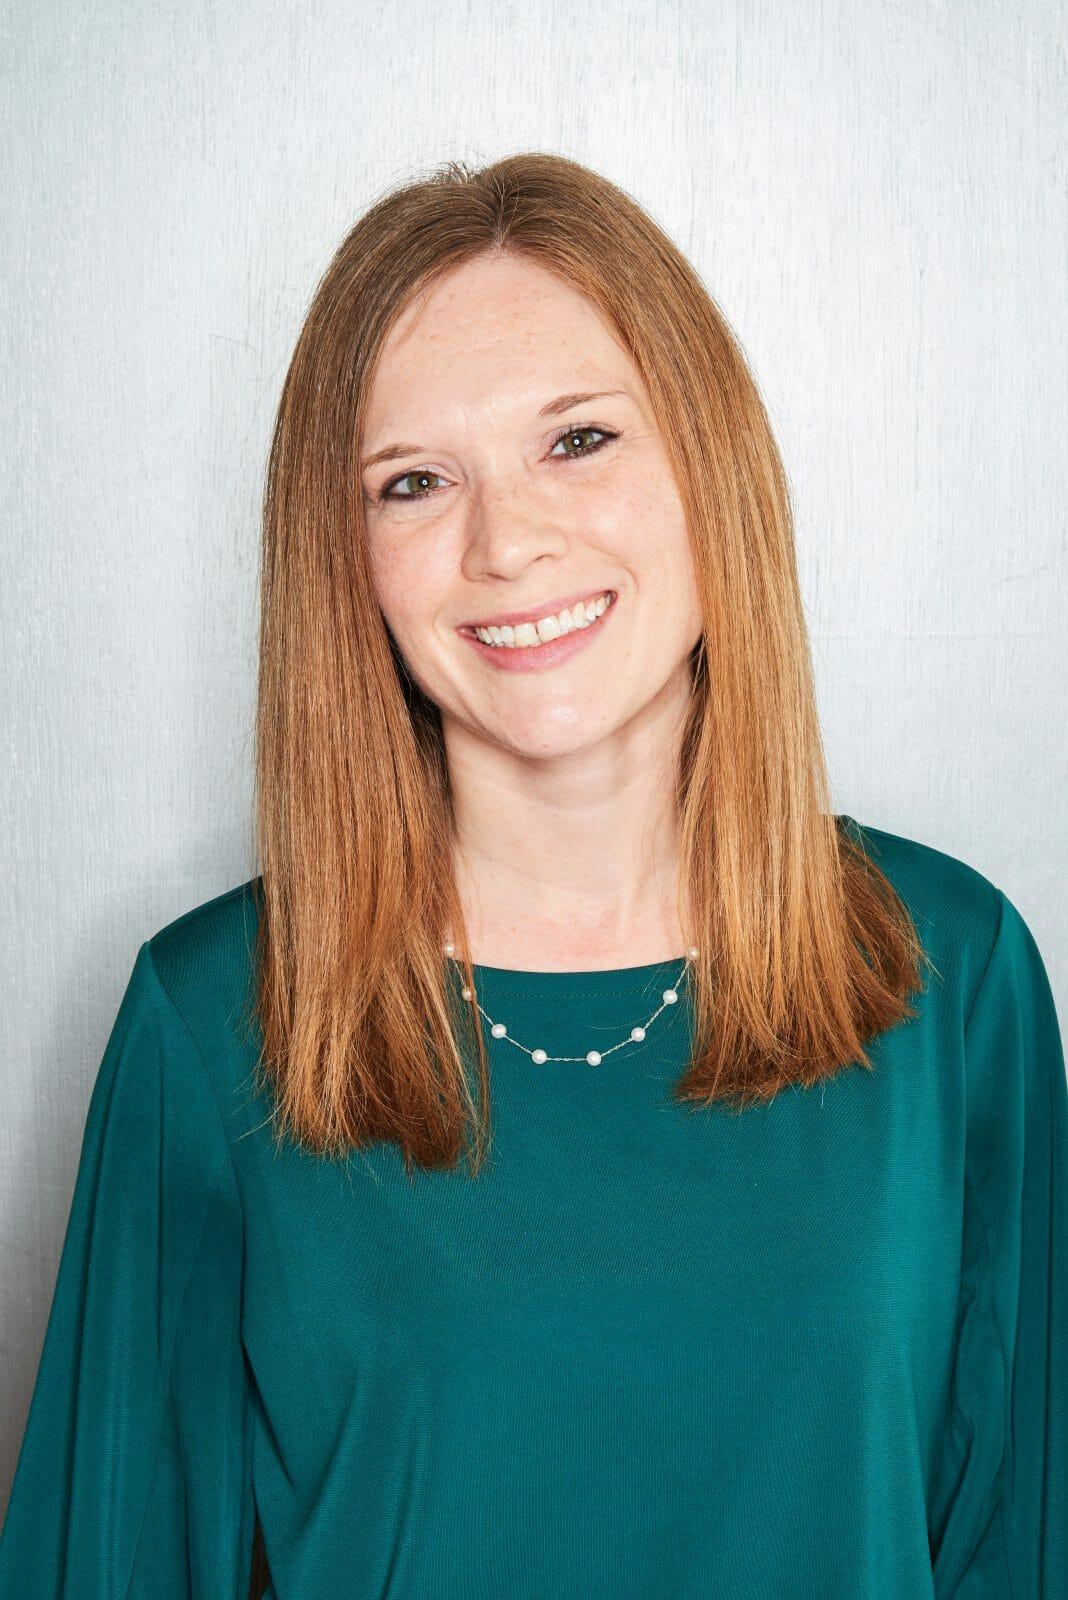 Jessica Trygstad, CSCOE director of communications